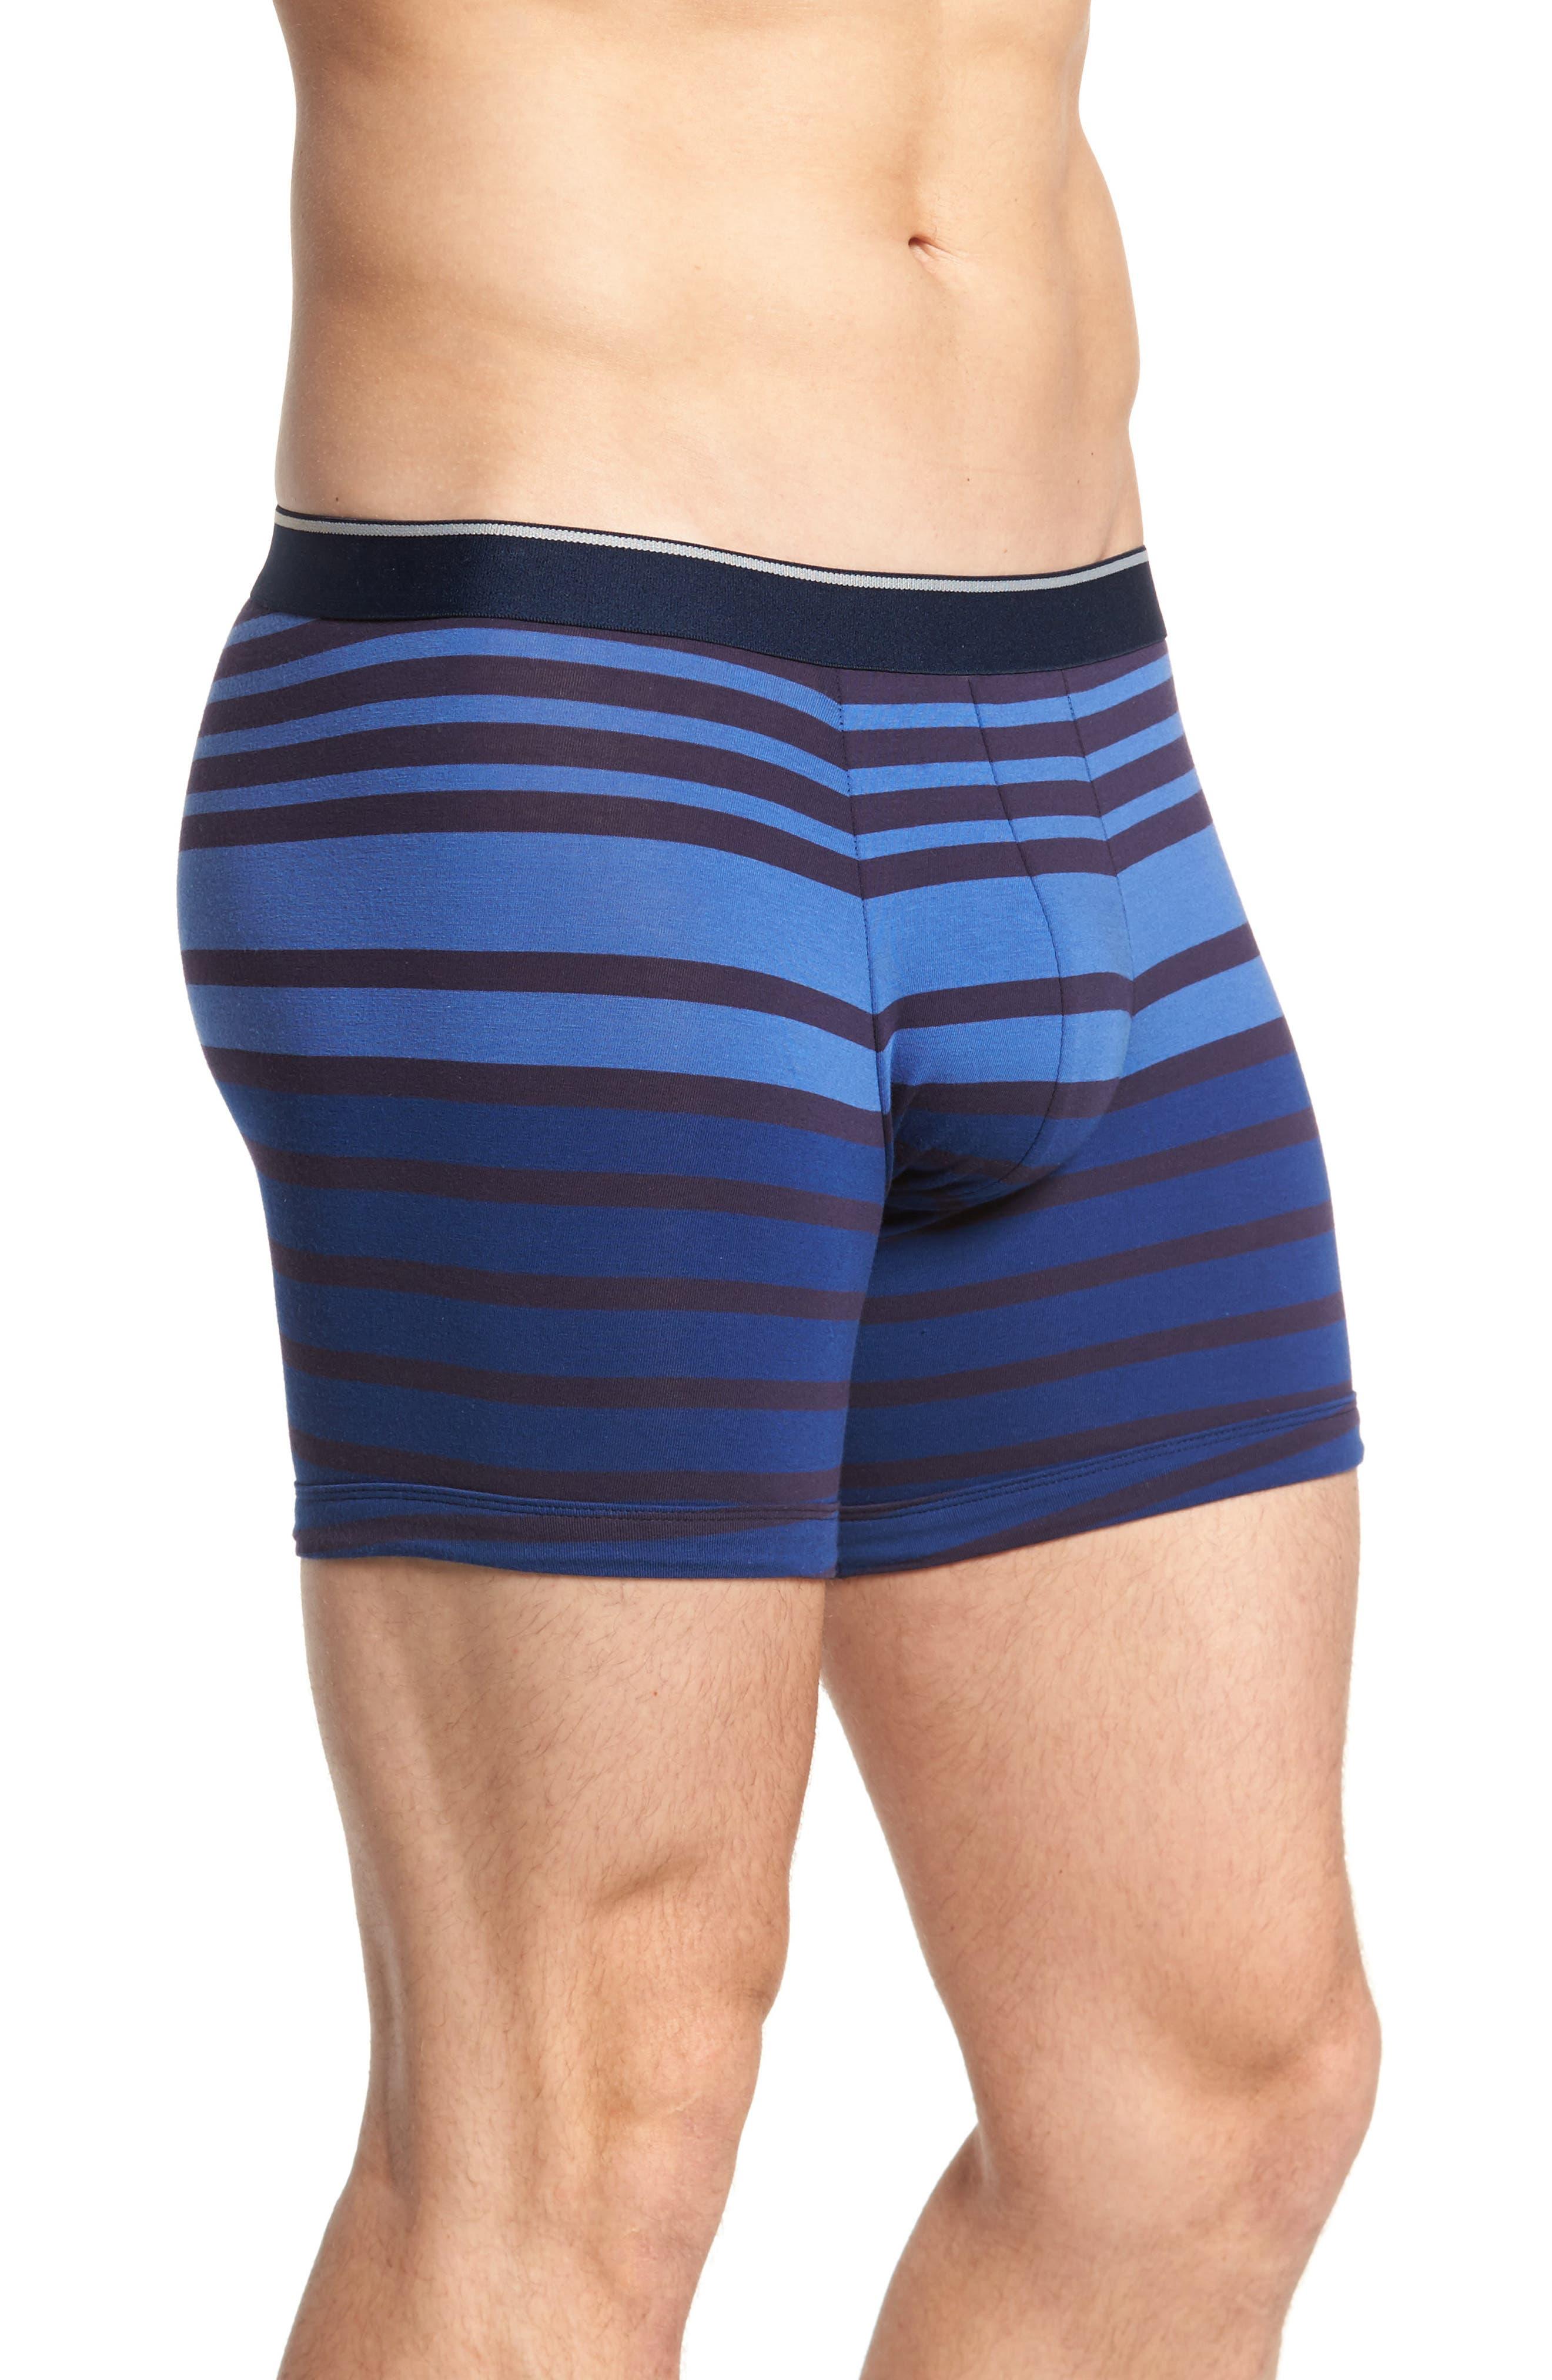 3-Pack Boxer Briefs,                             Alternate thumbnail 3, color,                             Navy/ Navy-Blue Stripe